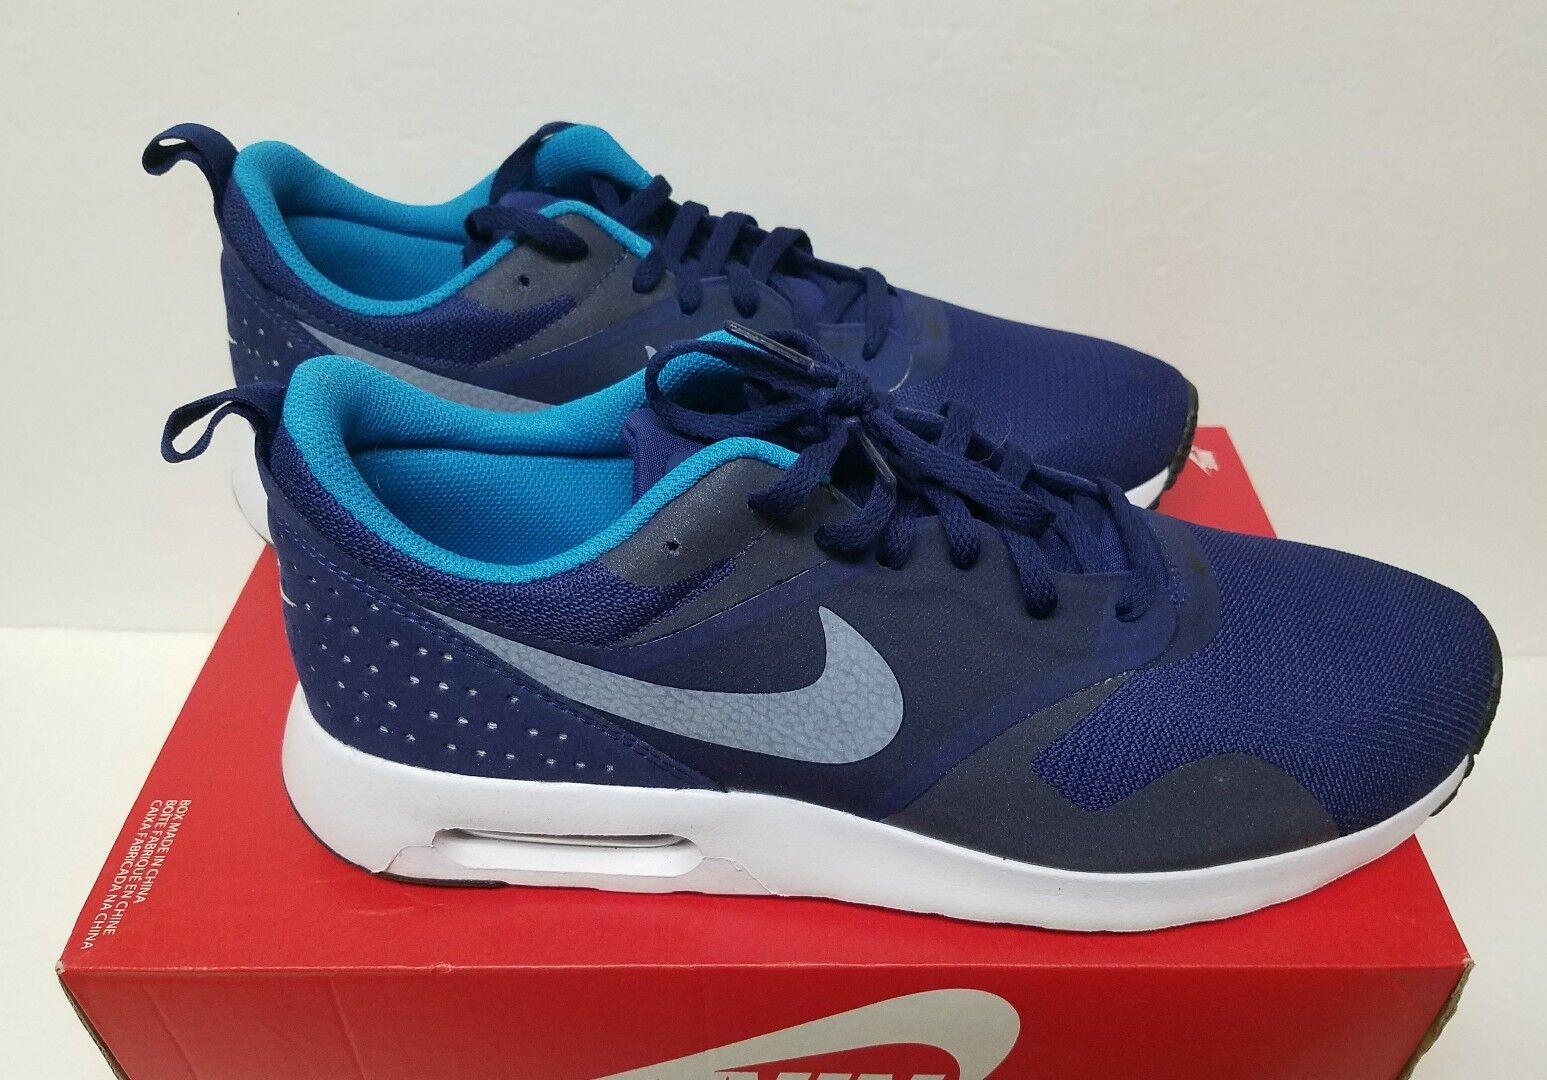 Nike air max tavas sz 11 lagoon-nero blu reale / white-bl lagoon-nero 11 uomini 705149 405 f16f23